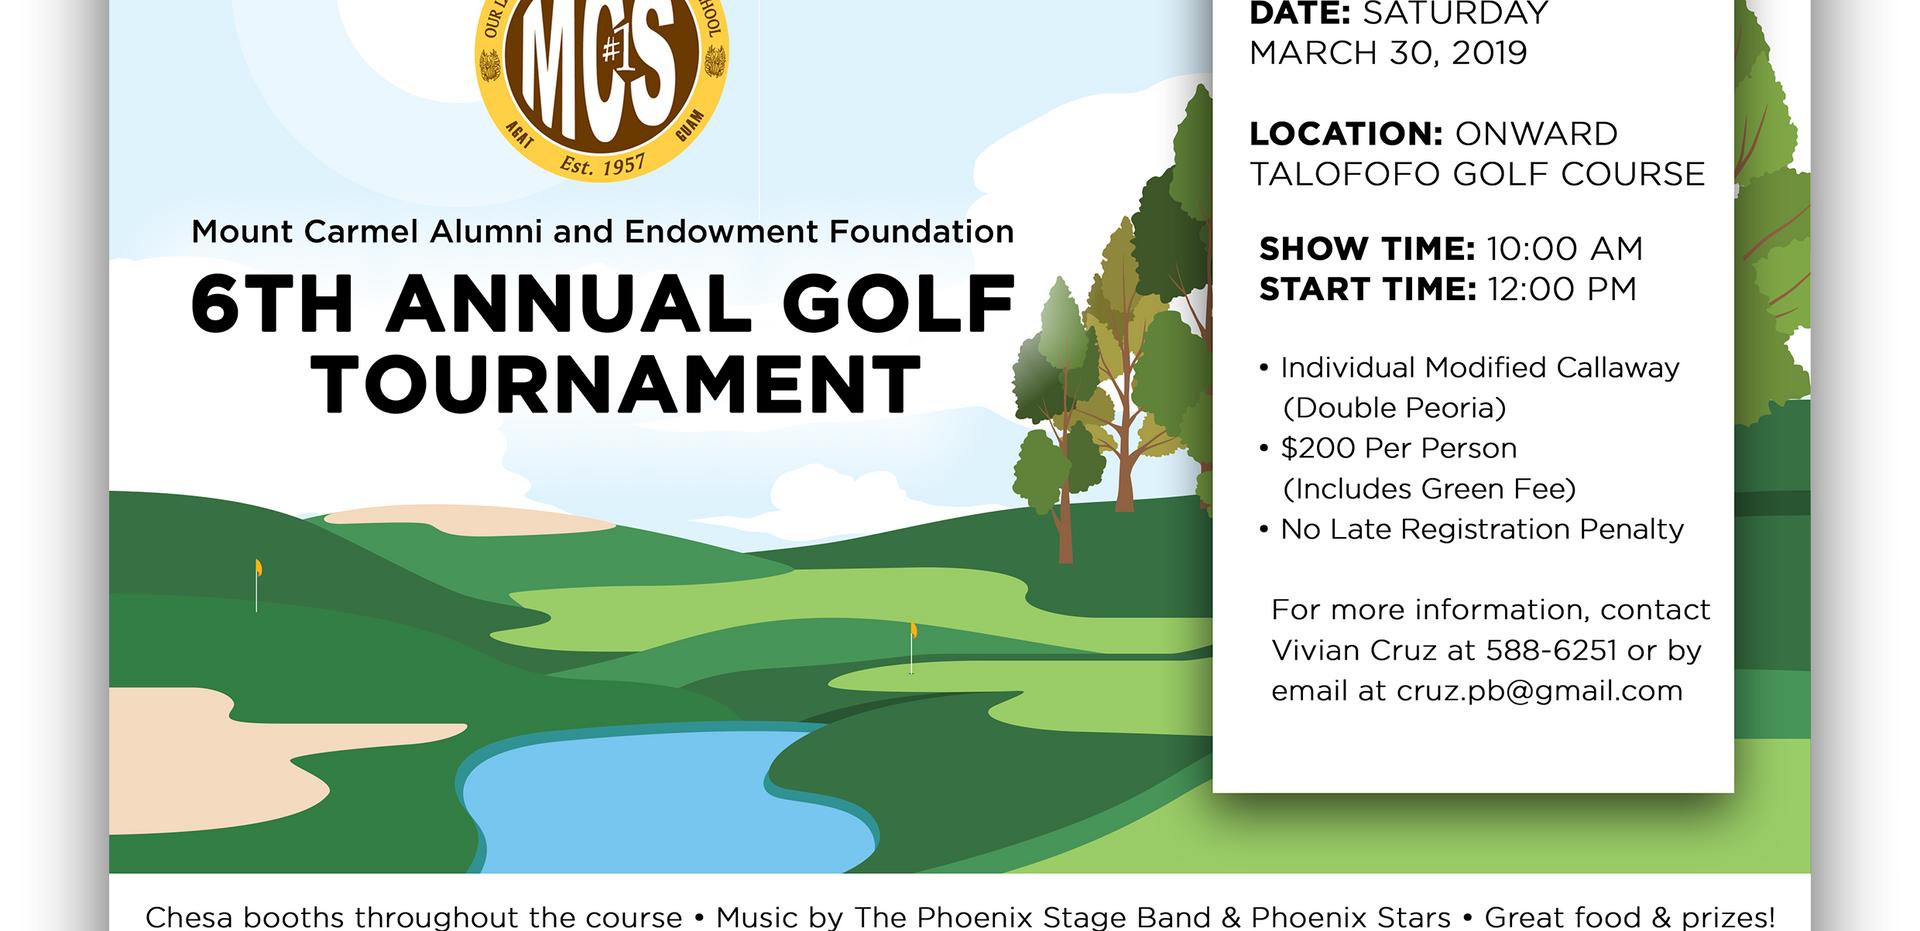 MCS Annual Golf Tournament Postcard Design by Kaitlynn Stone